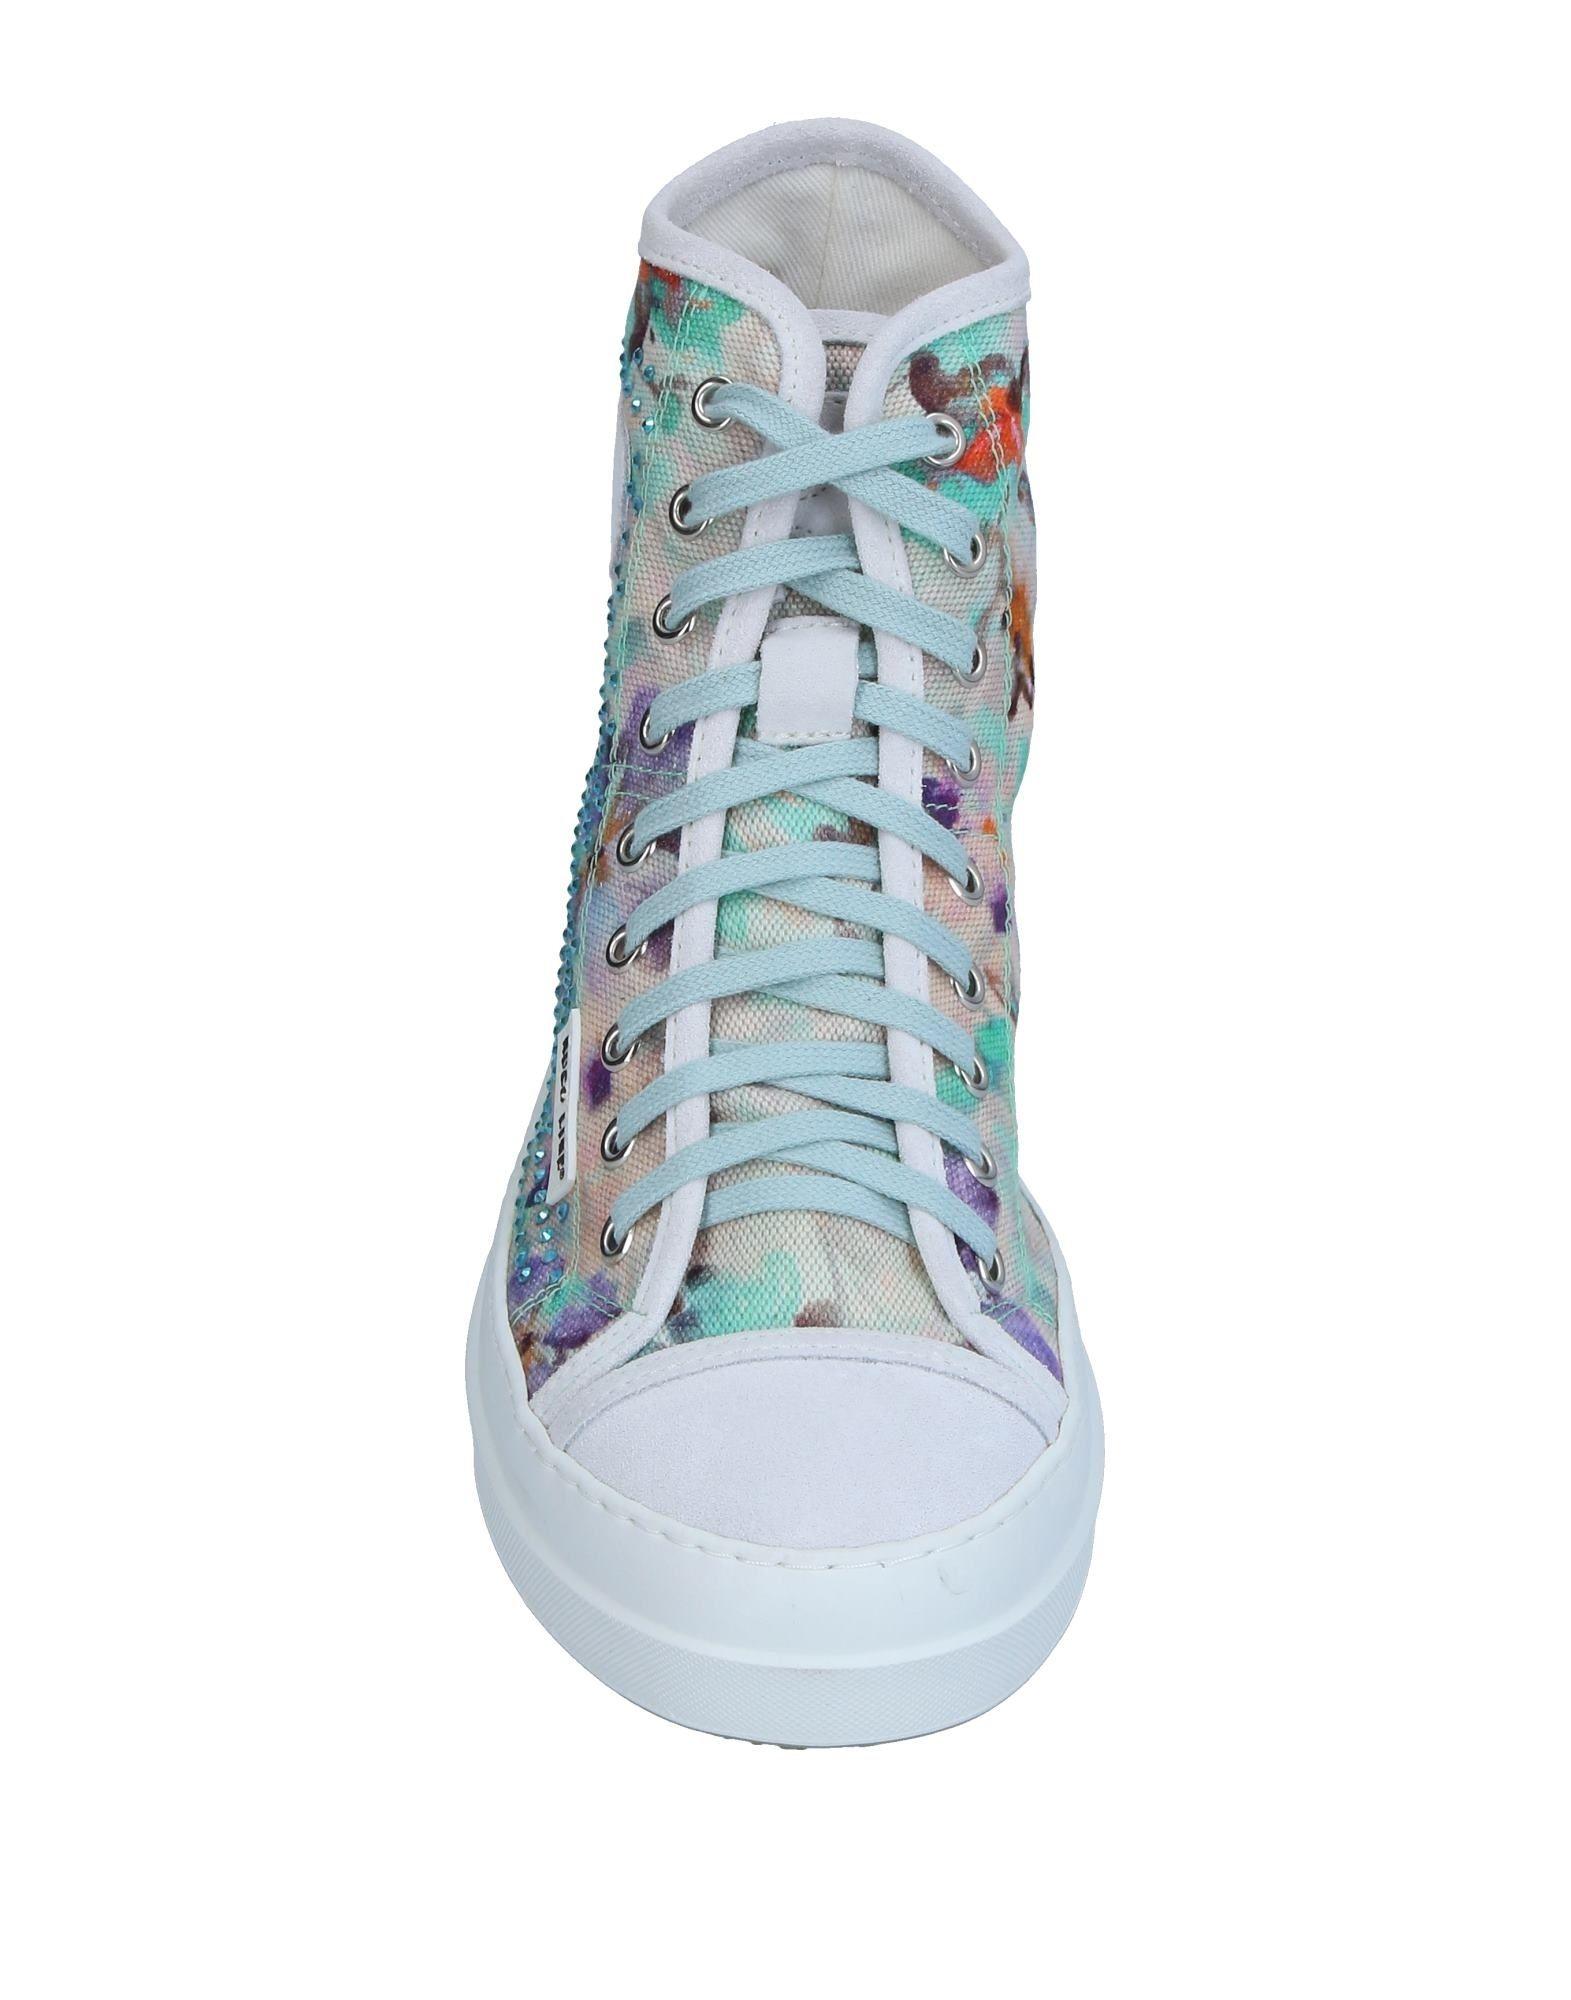 Ruco Sneakers Line Sneakers Ruco Damen Gutes Preis-Leistungs-Verhältnis, es lohnt sich ed24e0